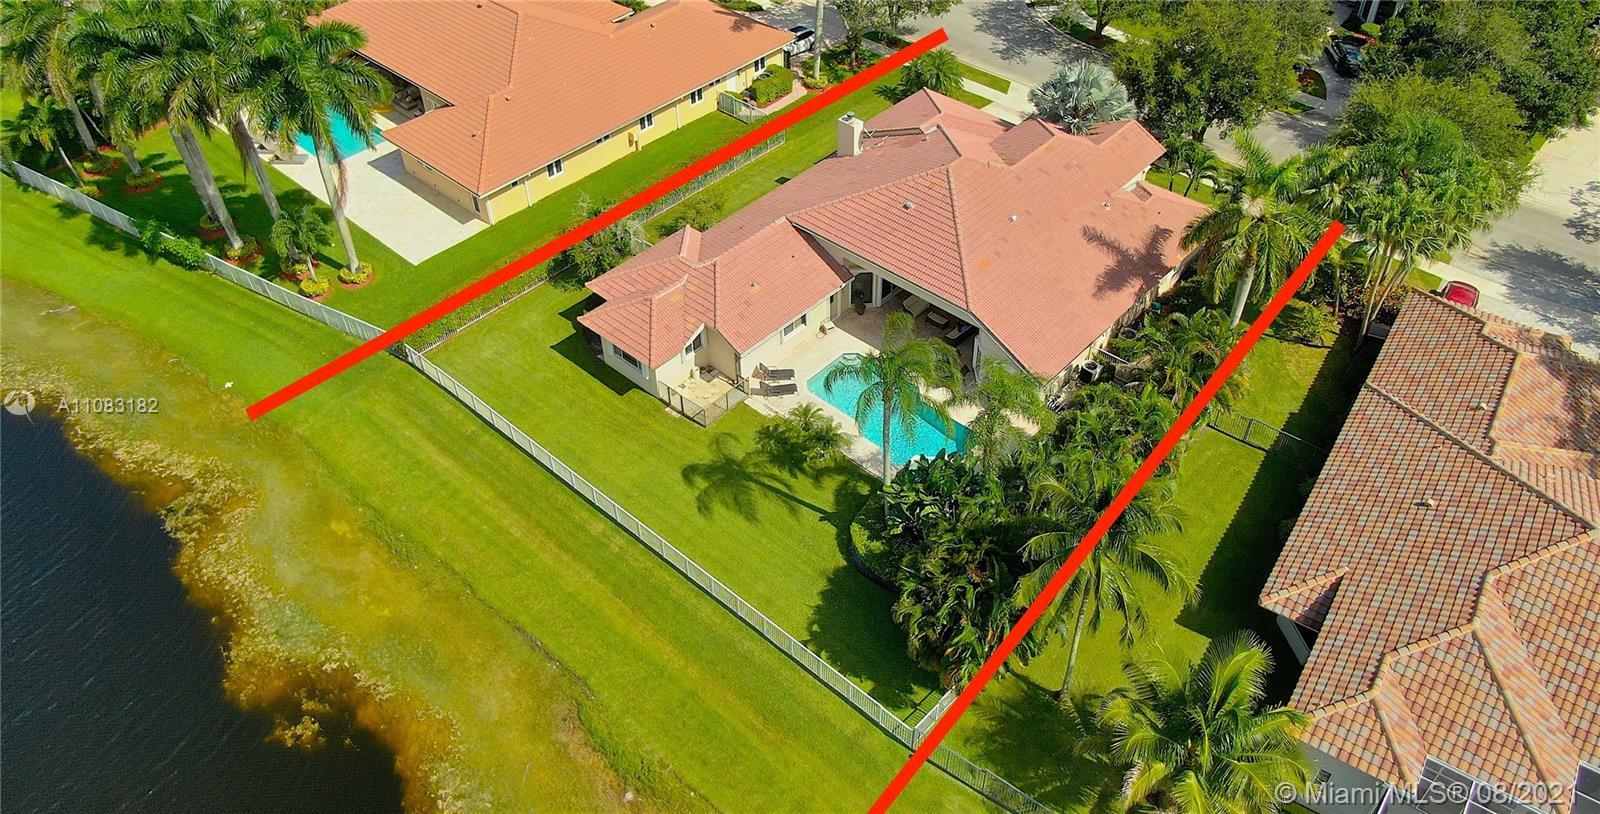 Weston Hills - 2922 Medinah, Weston, FL 33332